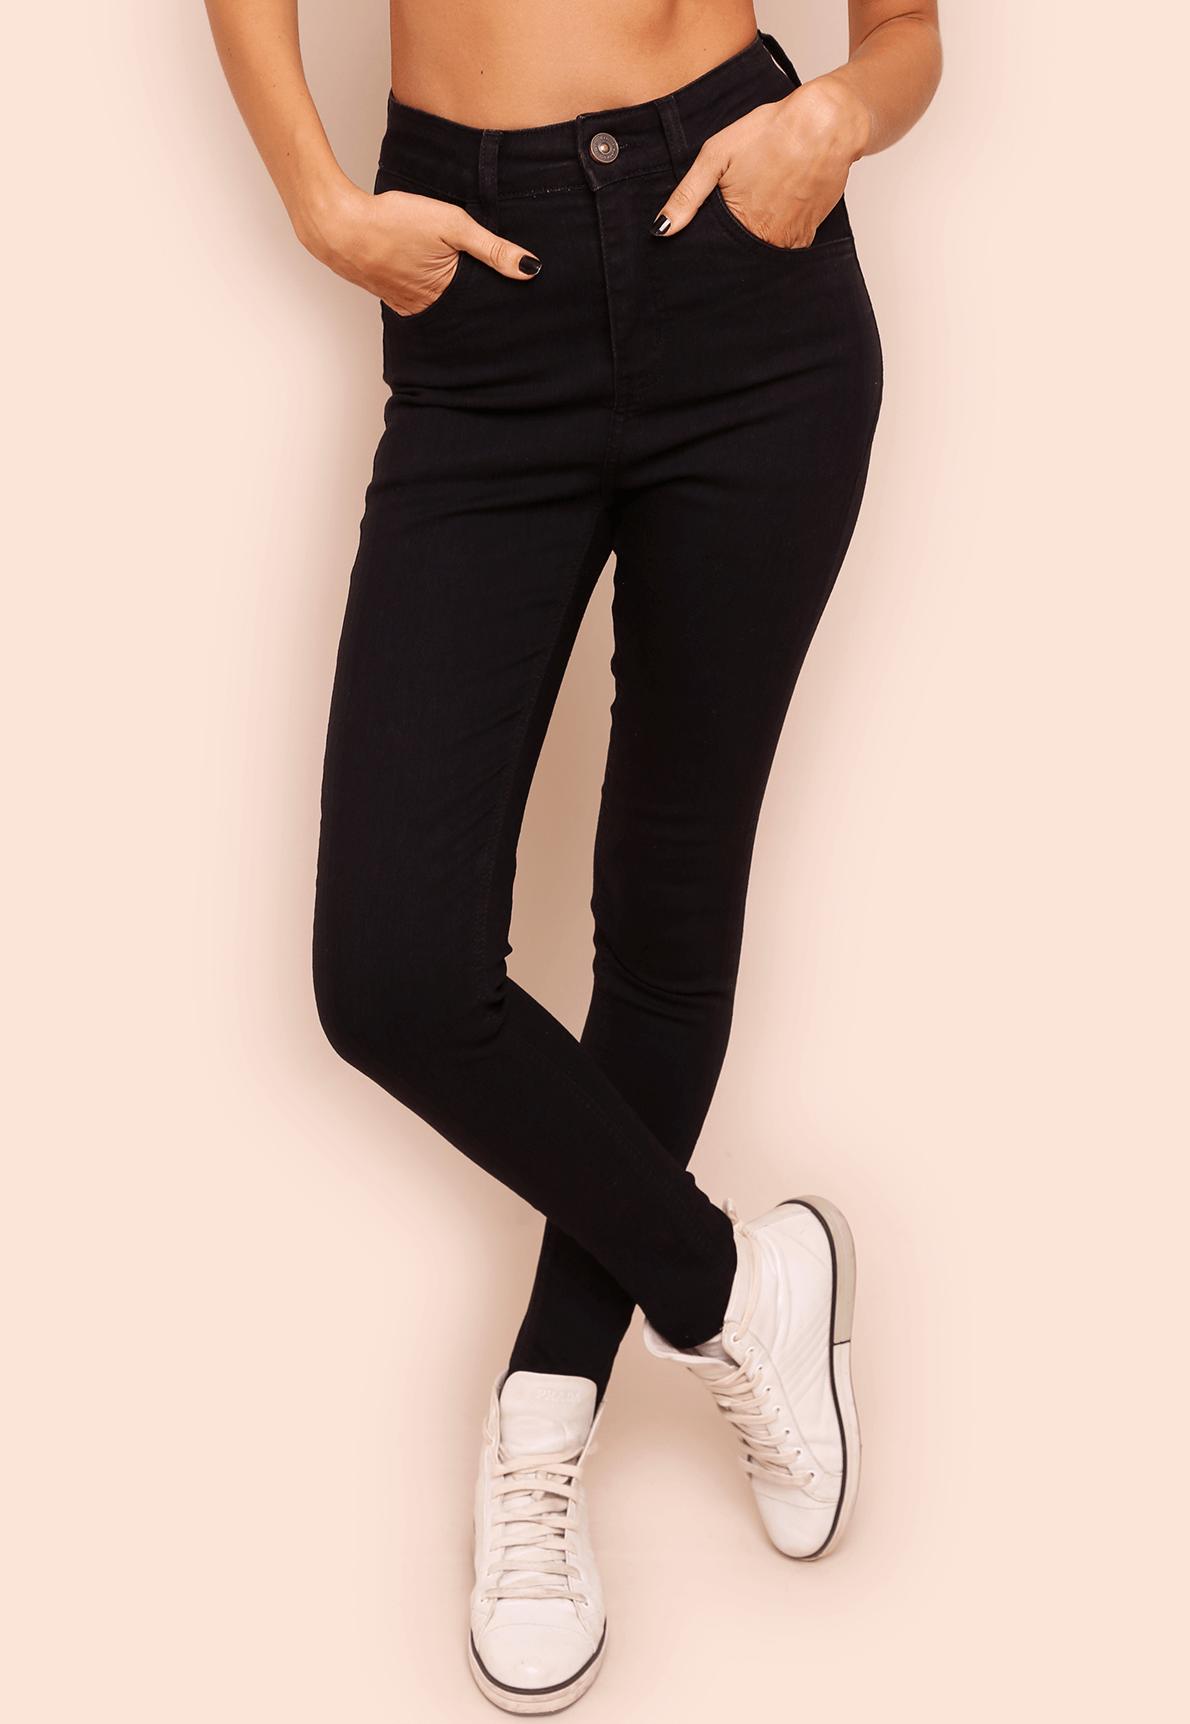 34625-calca-jeans-urban-mundo-lolita-05